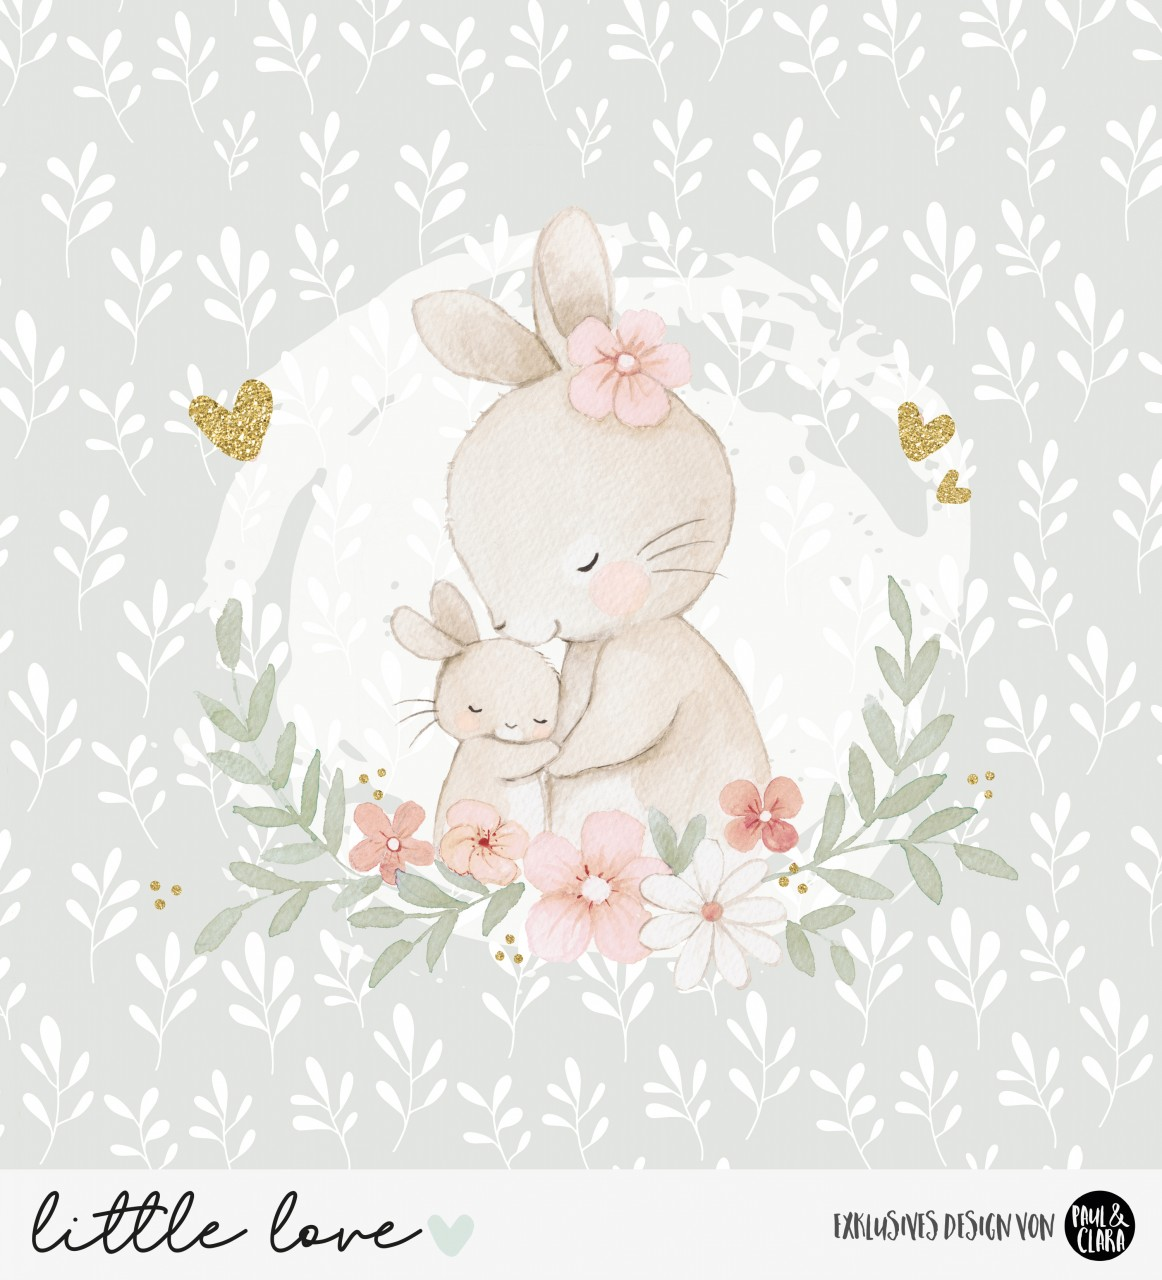 little love - Panel Hasenmama GRAUGRÜN *Bio-Jersey*